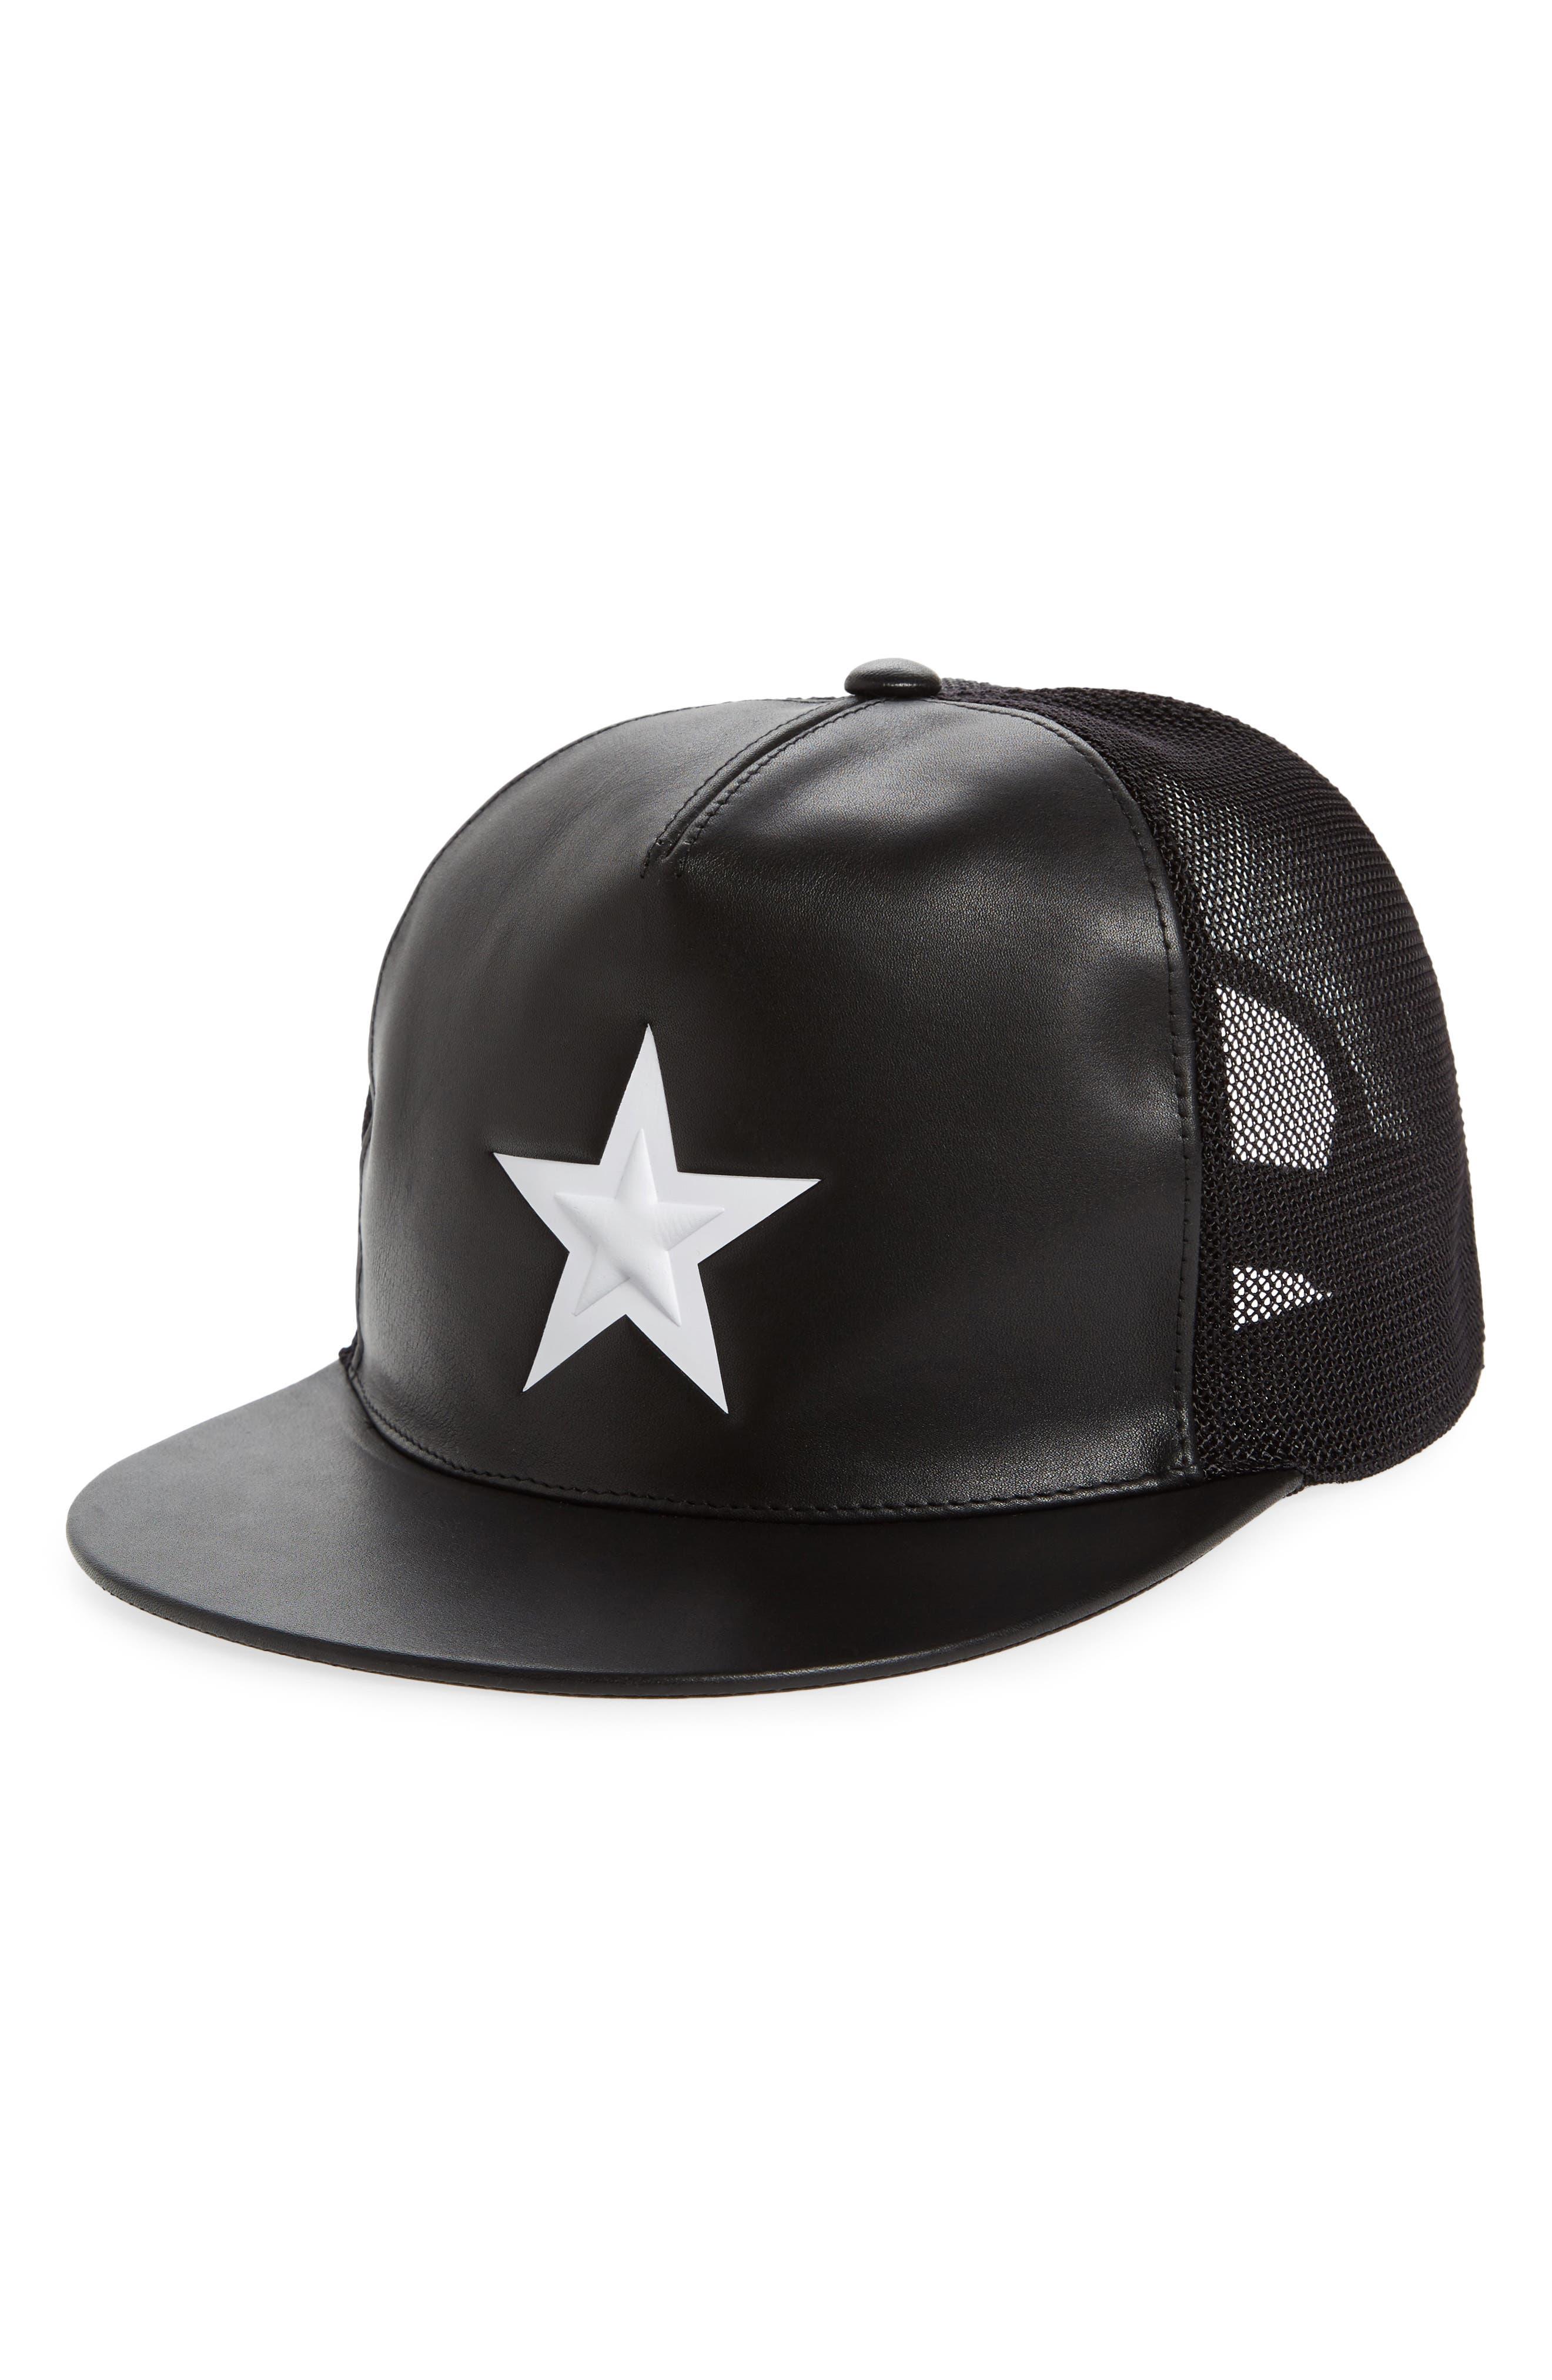 Star Leather Trucker Cap,                         Main,                         color, Black/White